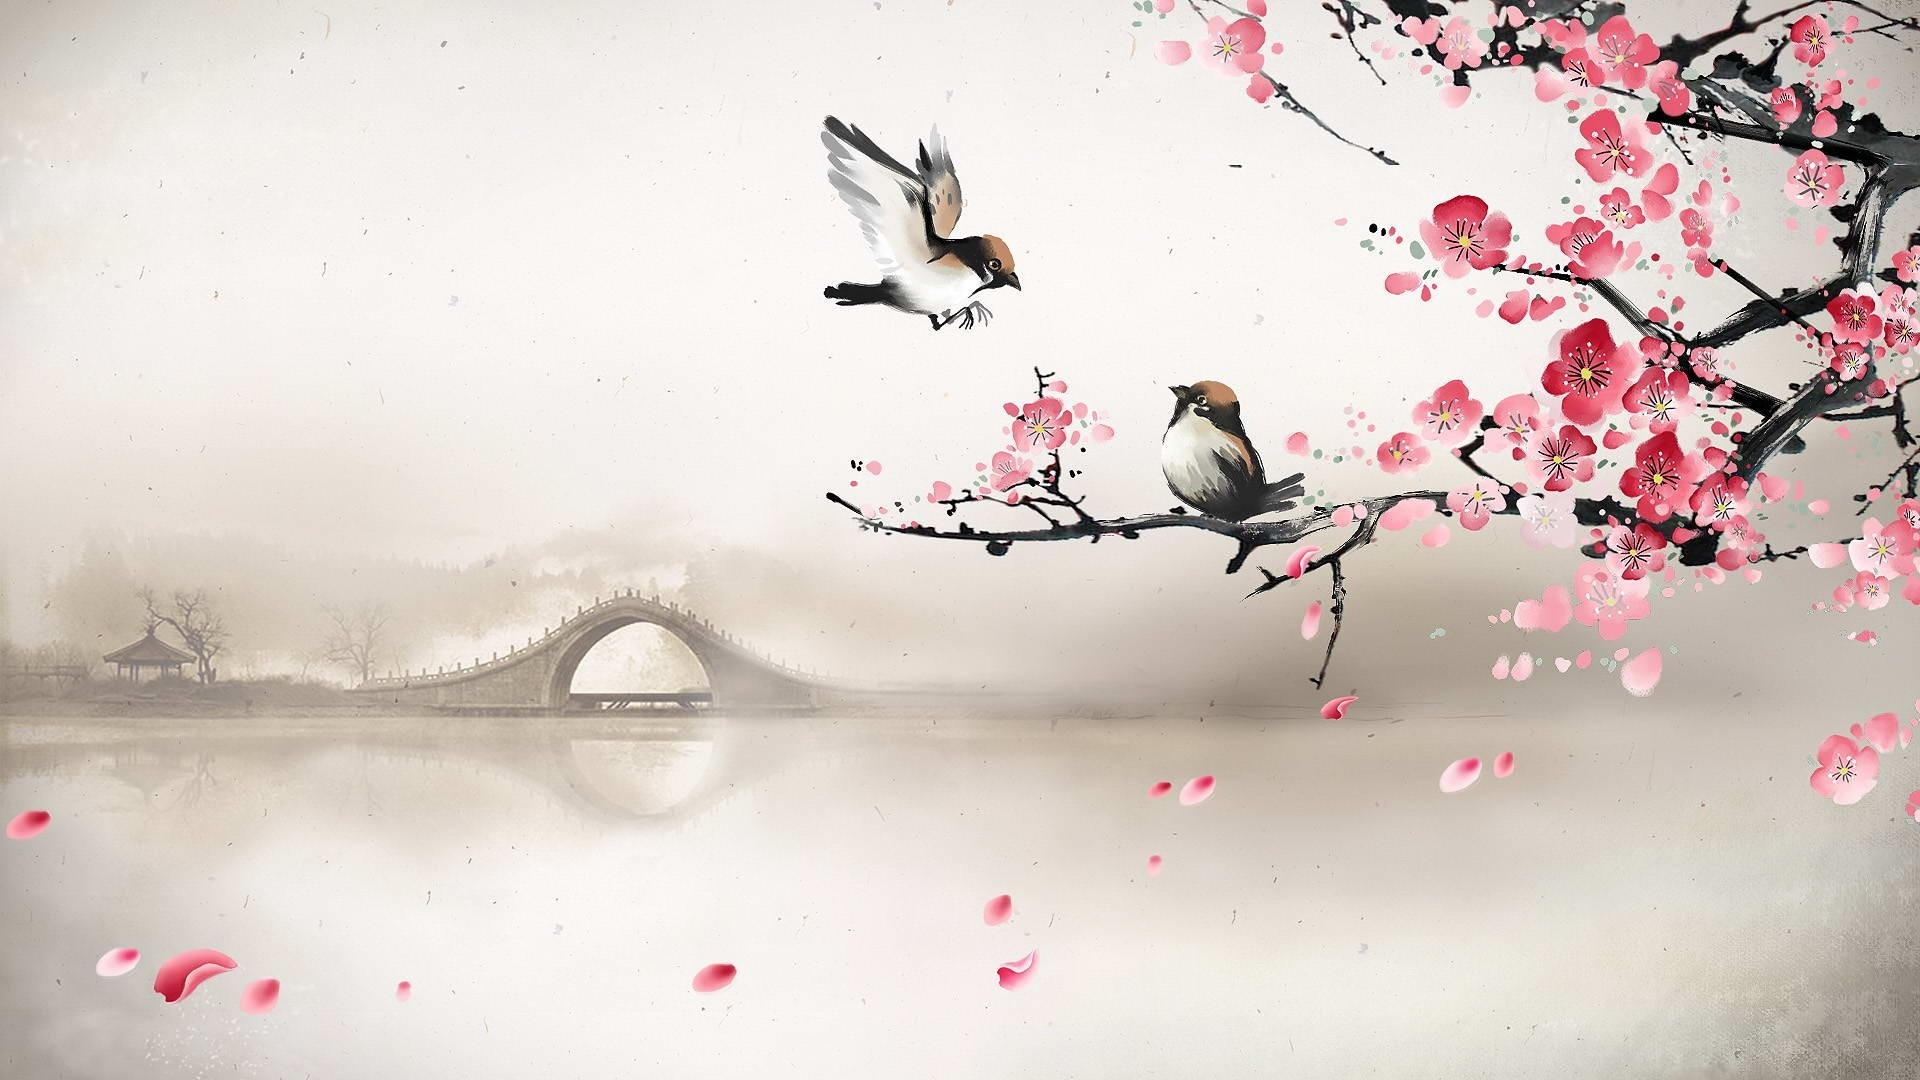 Drawn sakura blossom oriental арт весна разное река лепестки